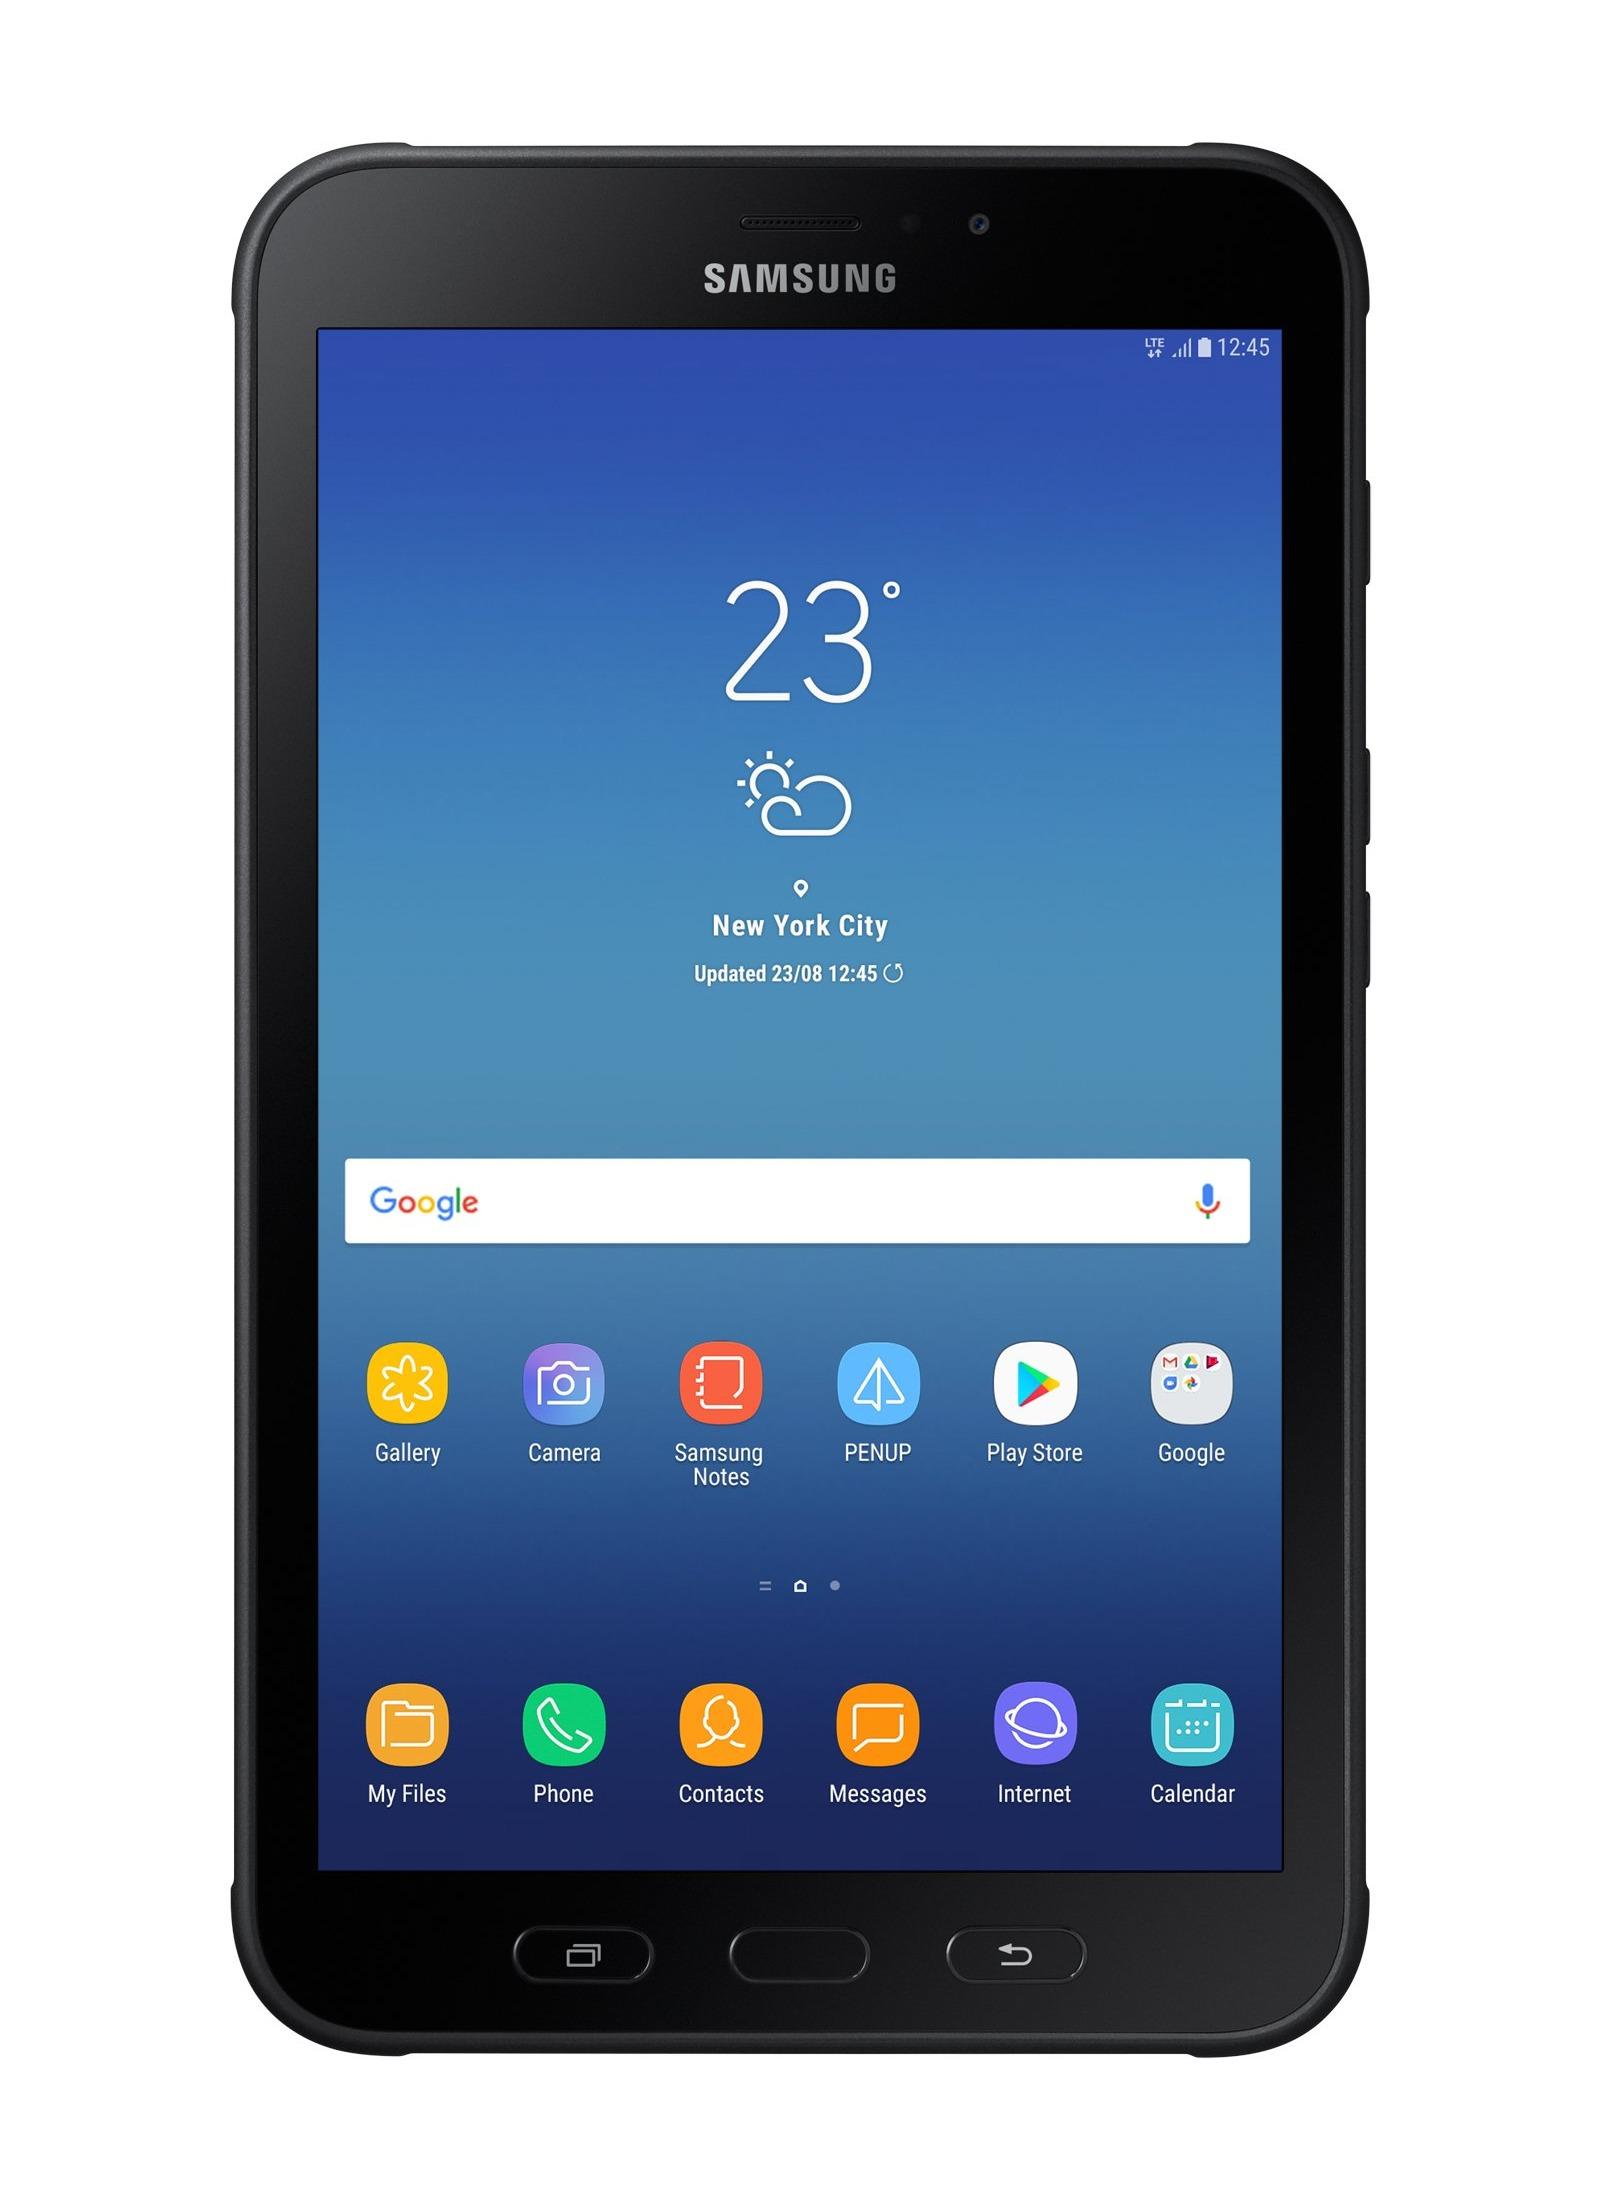 Samsung Galaxy Tab Active 2 8.0 WiFi + 4G Tablet